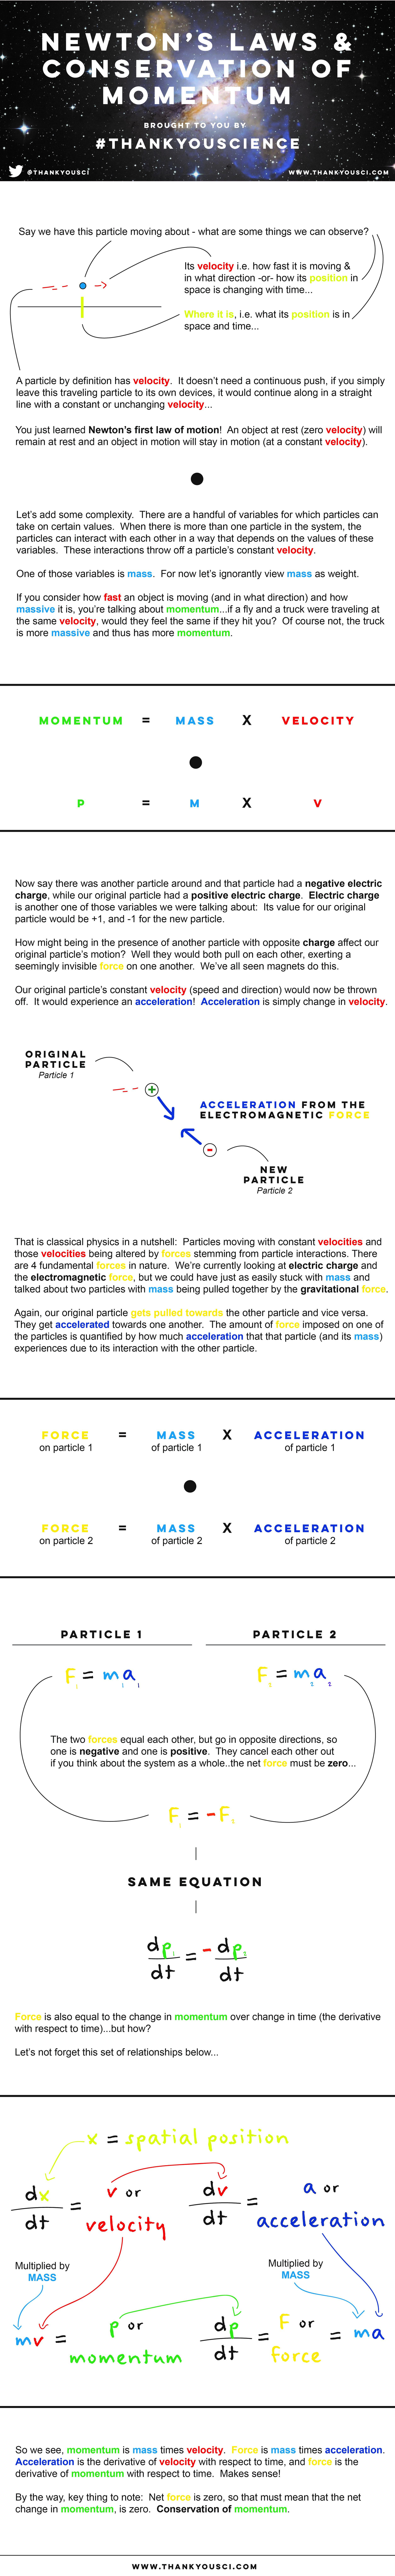 Worksheet Conservation Of Momentum